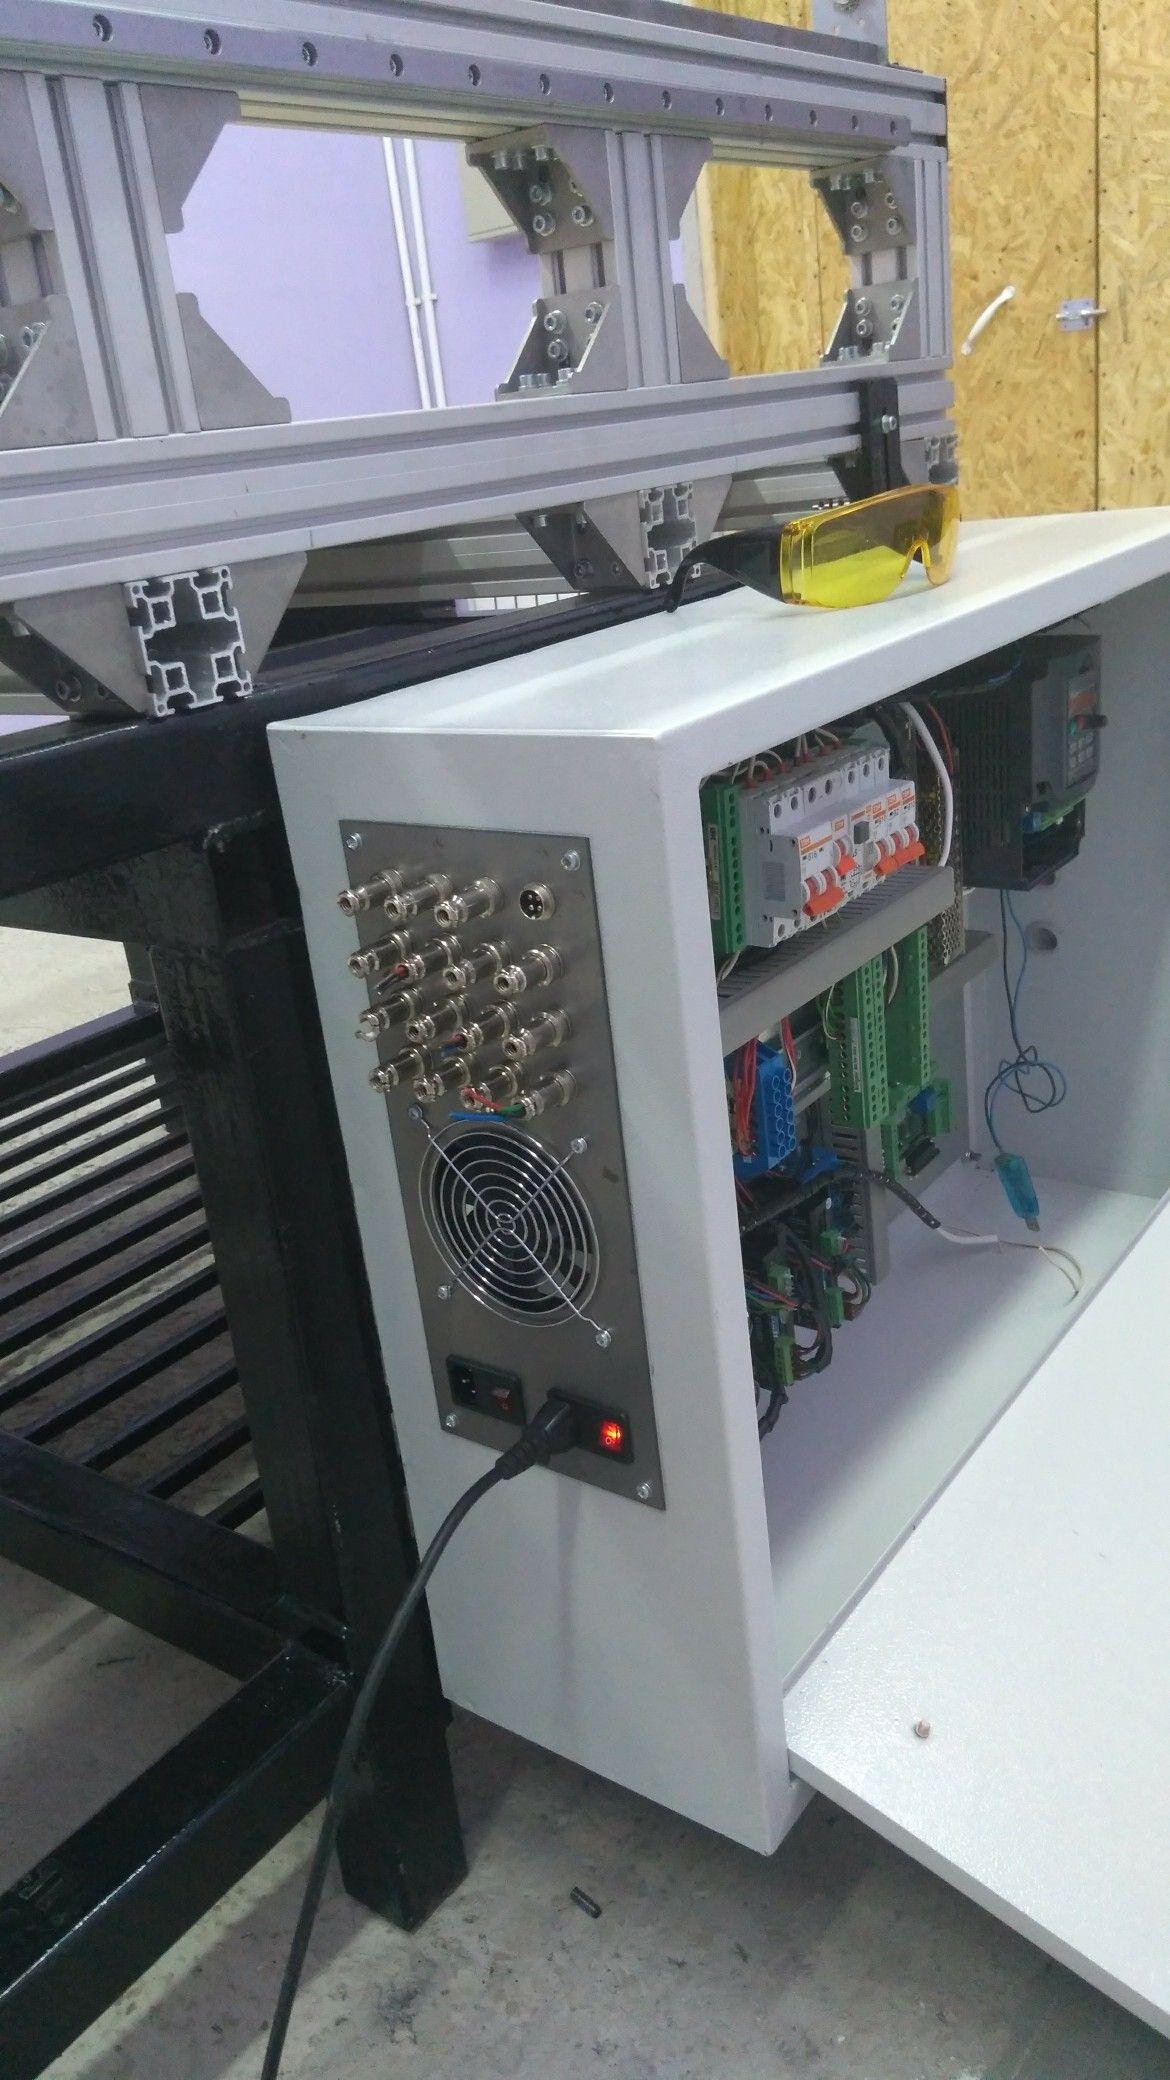 Pin De Stan Khalipa Em Selvox Cnc Build Log Projetos Cnc Cnc Painel De Ferramentas